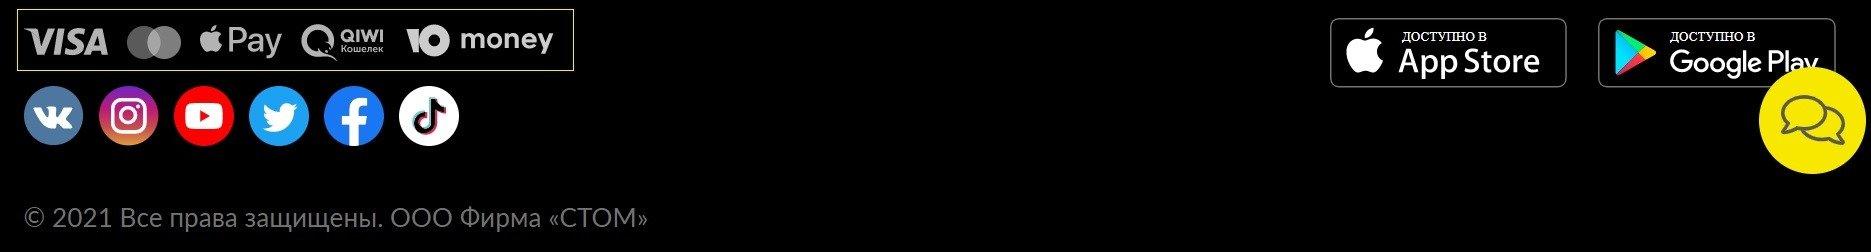 sposoby vyvoda sredstv betboom ru